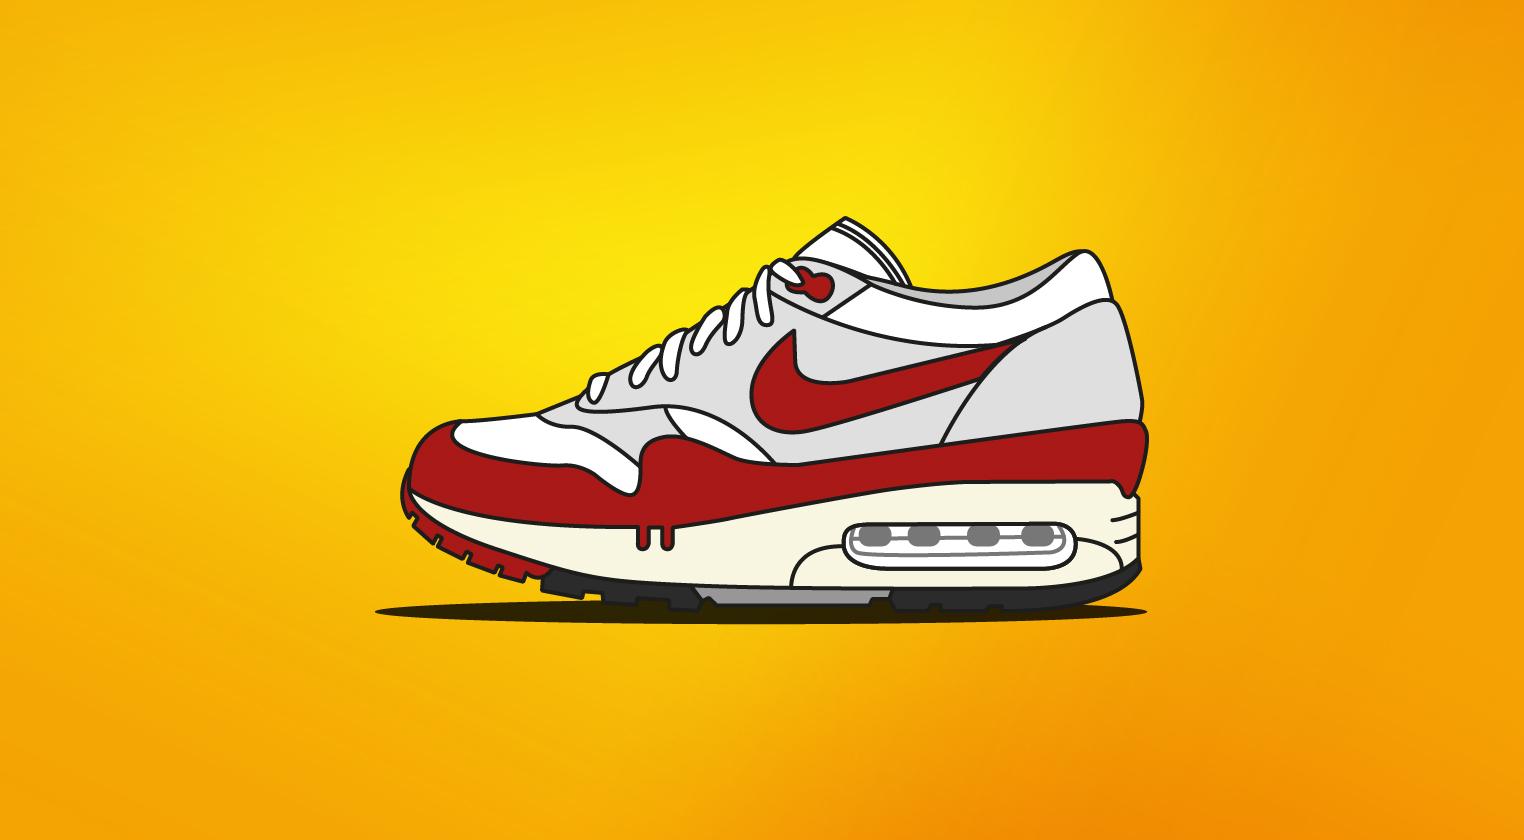 28a2b3ca Inspirational Designers - The man behind Nike Air Jordan's - Fifteen